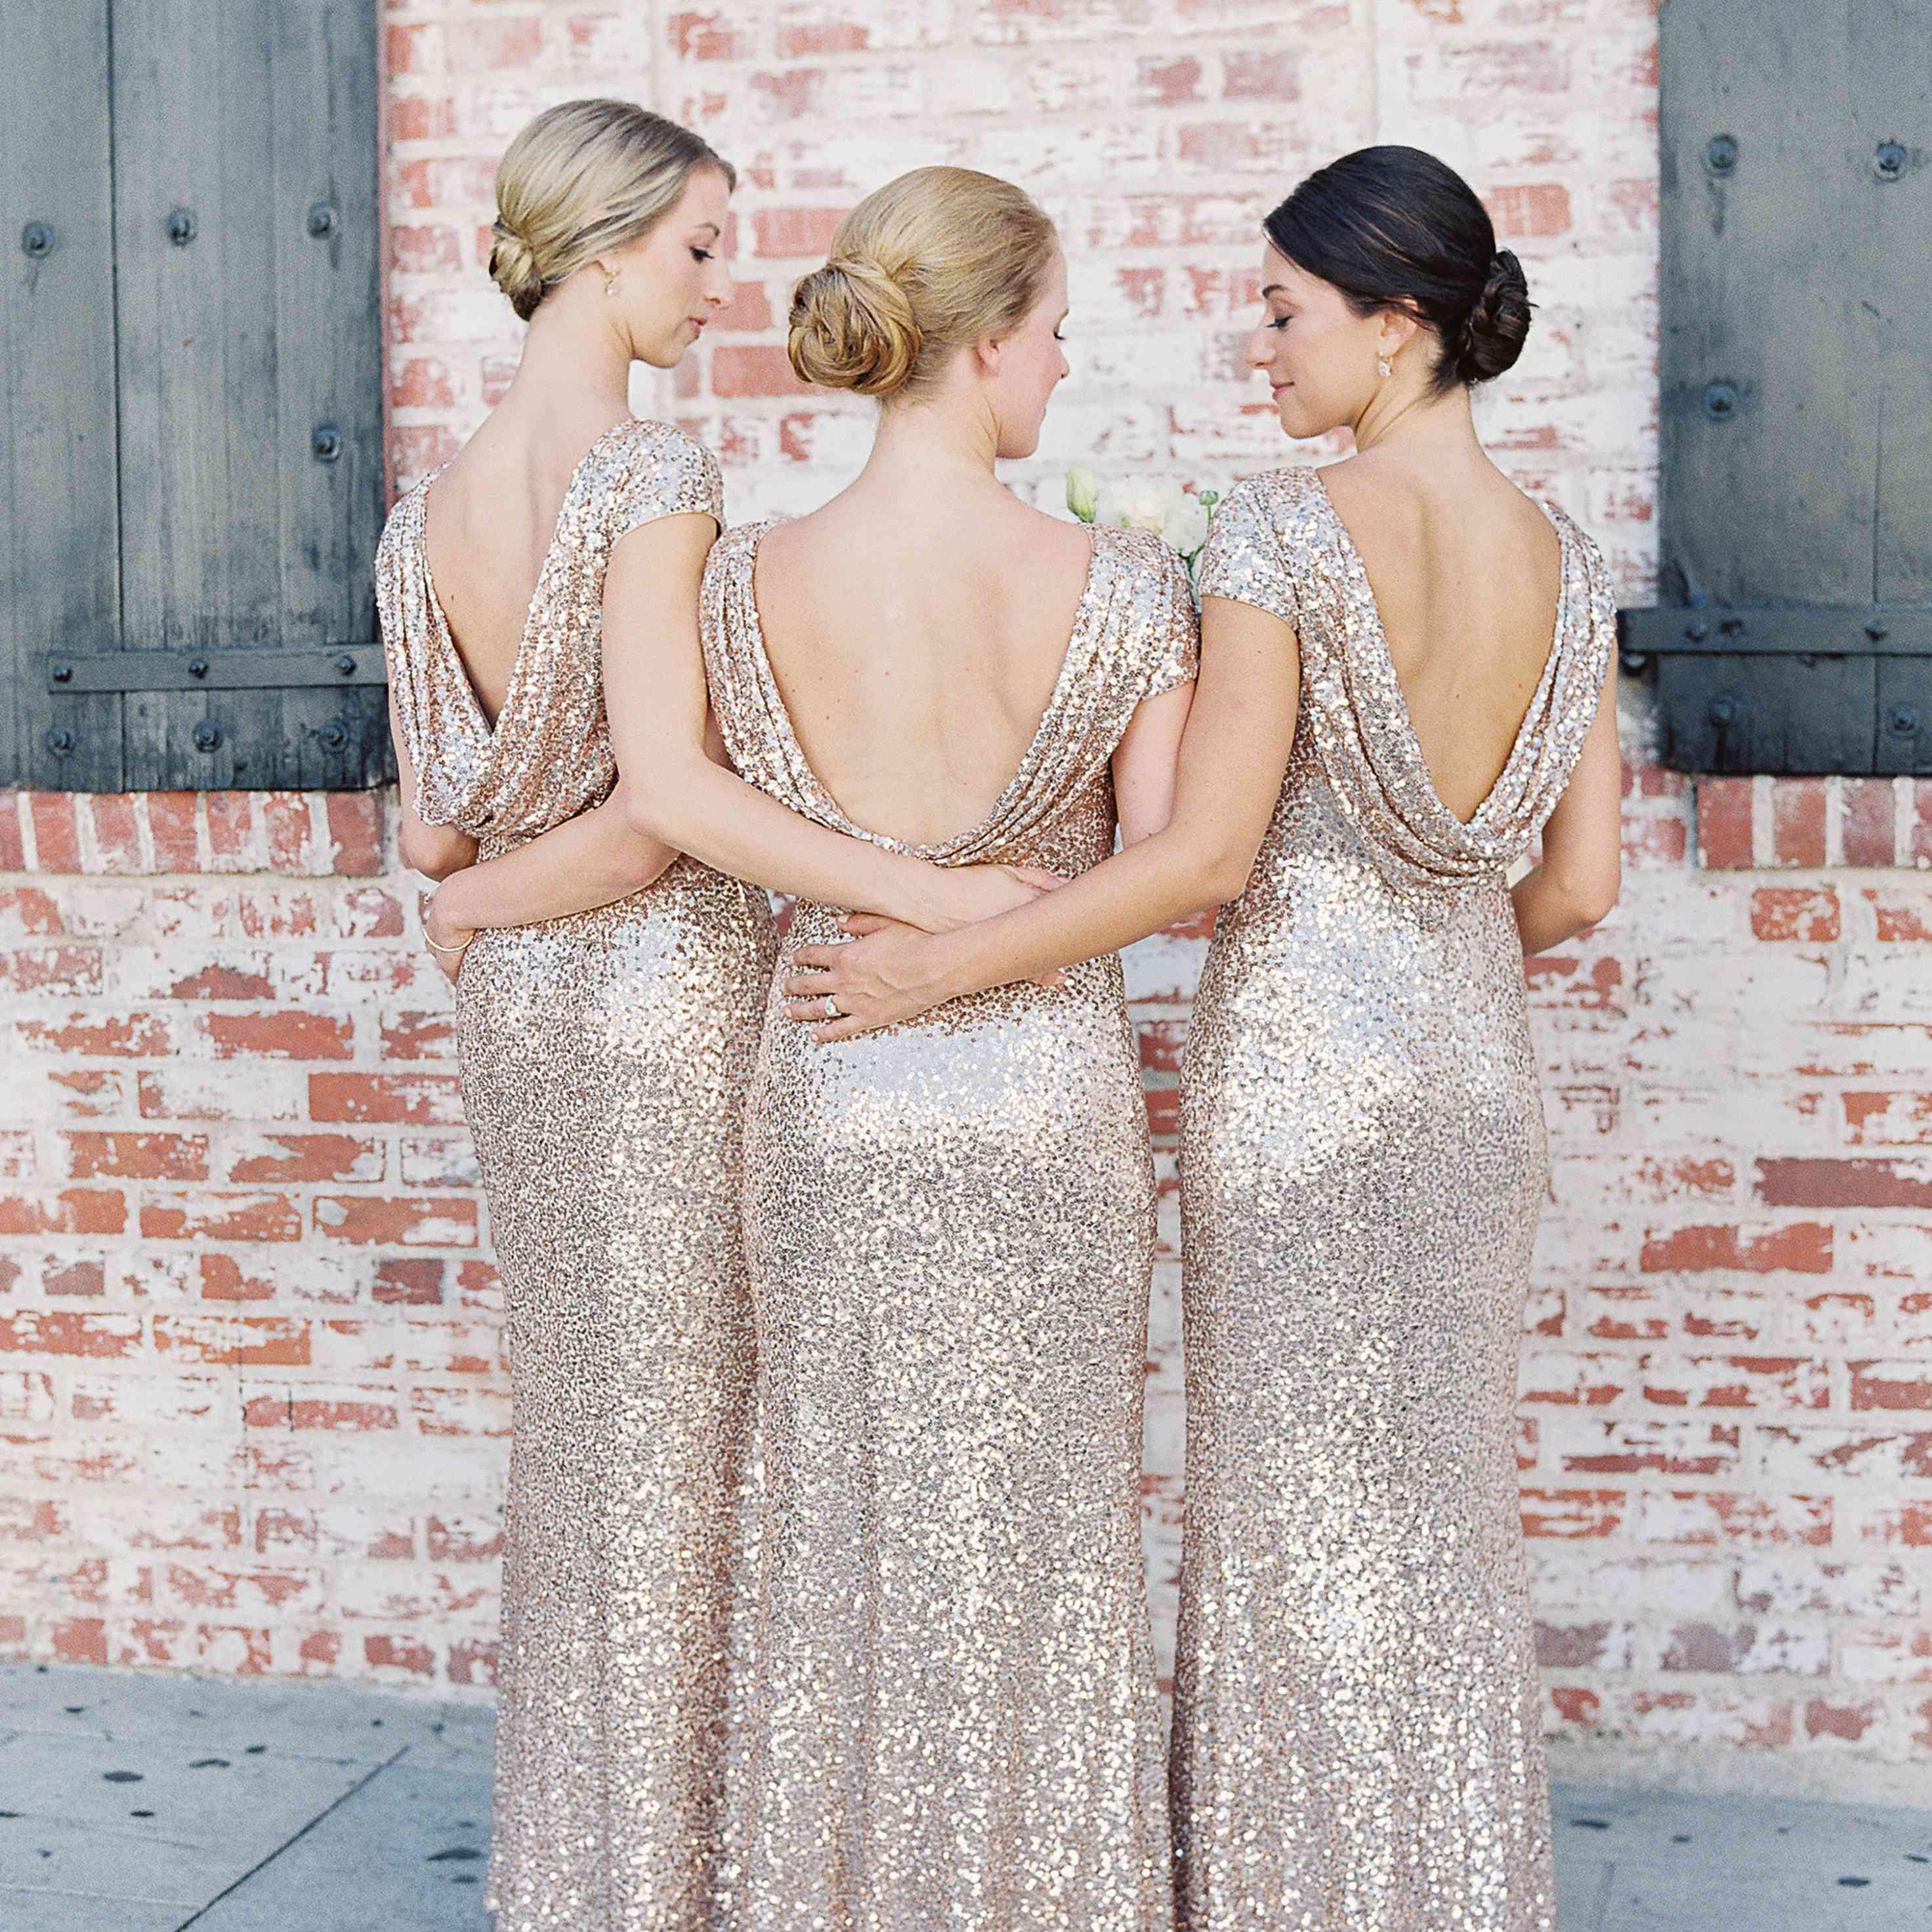 Bridesmaids in gold dresses